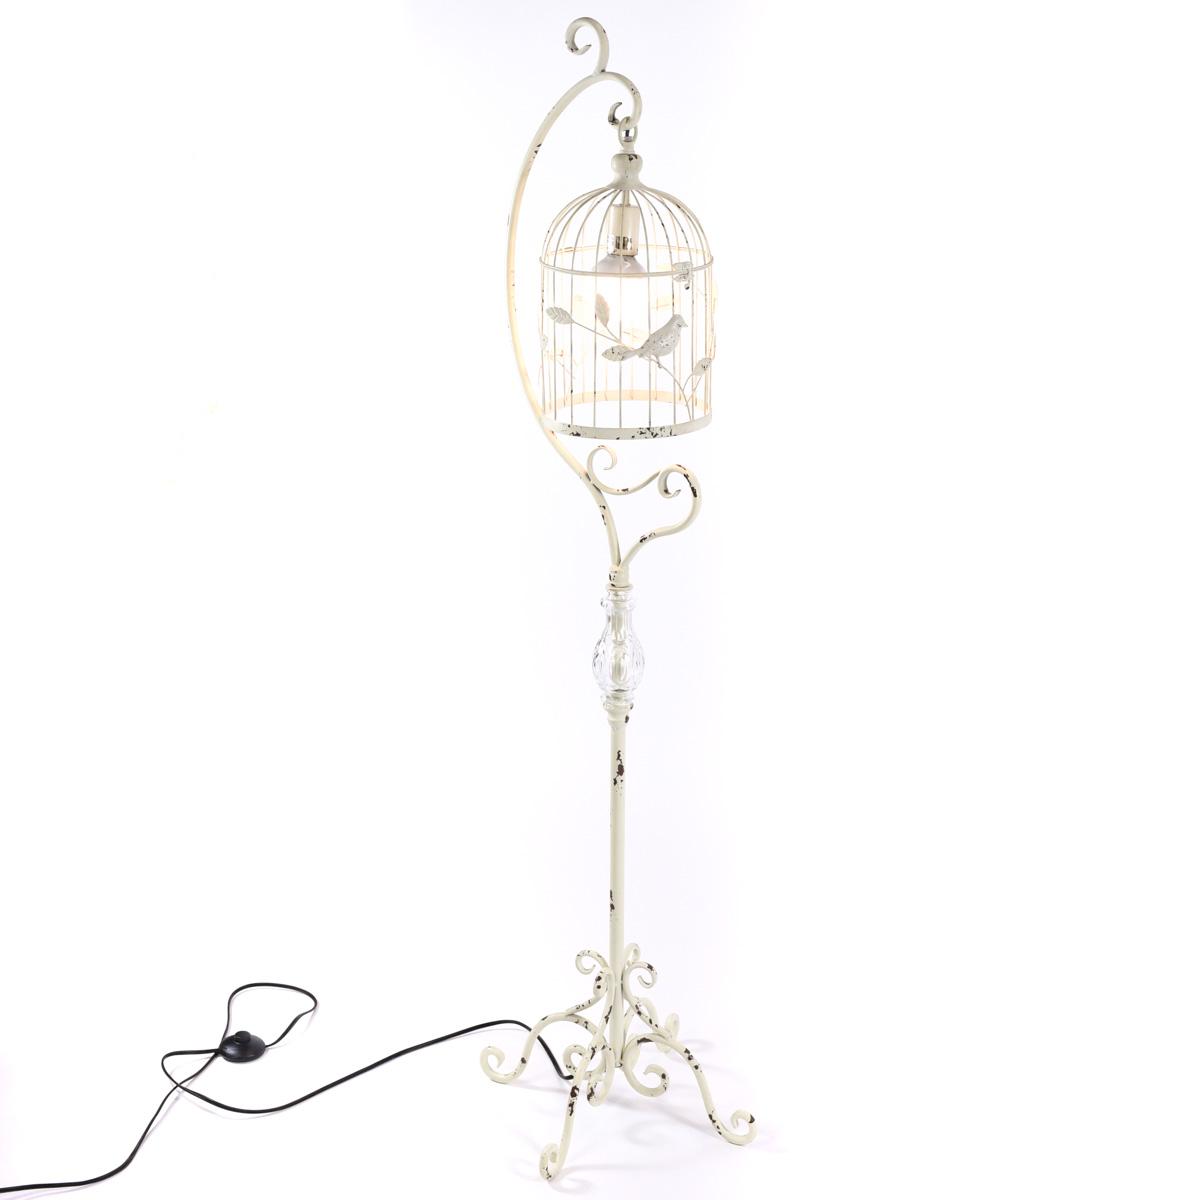 prev table lamp lappartement mathieu image store concept birdcage challieres